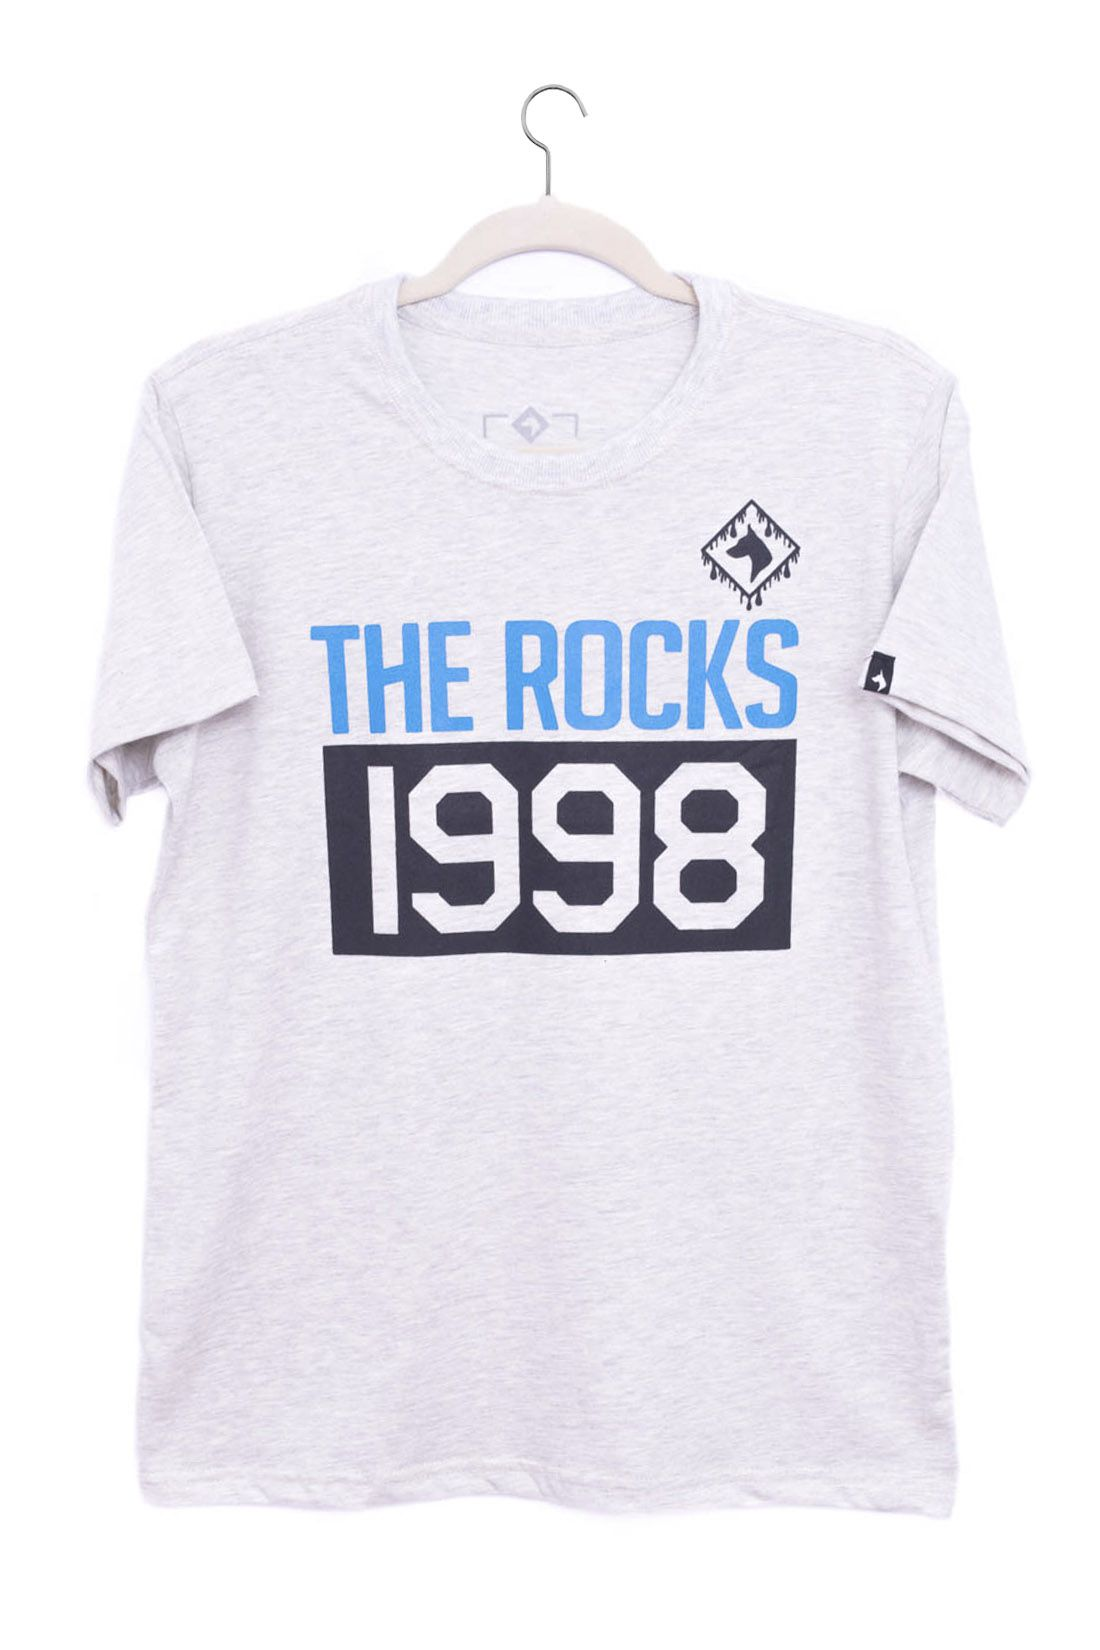 Camiseta Manga Curta 1998 The Rocks